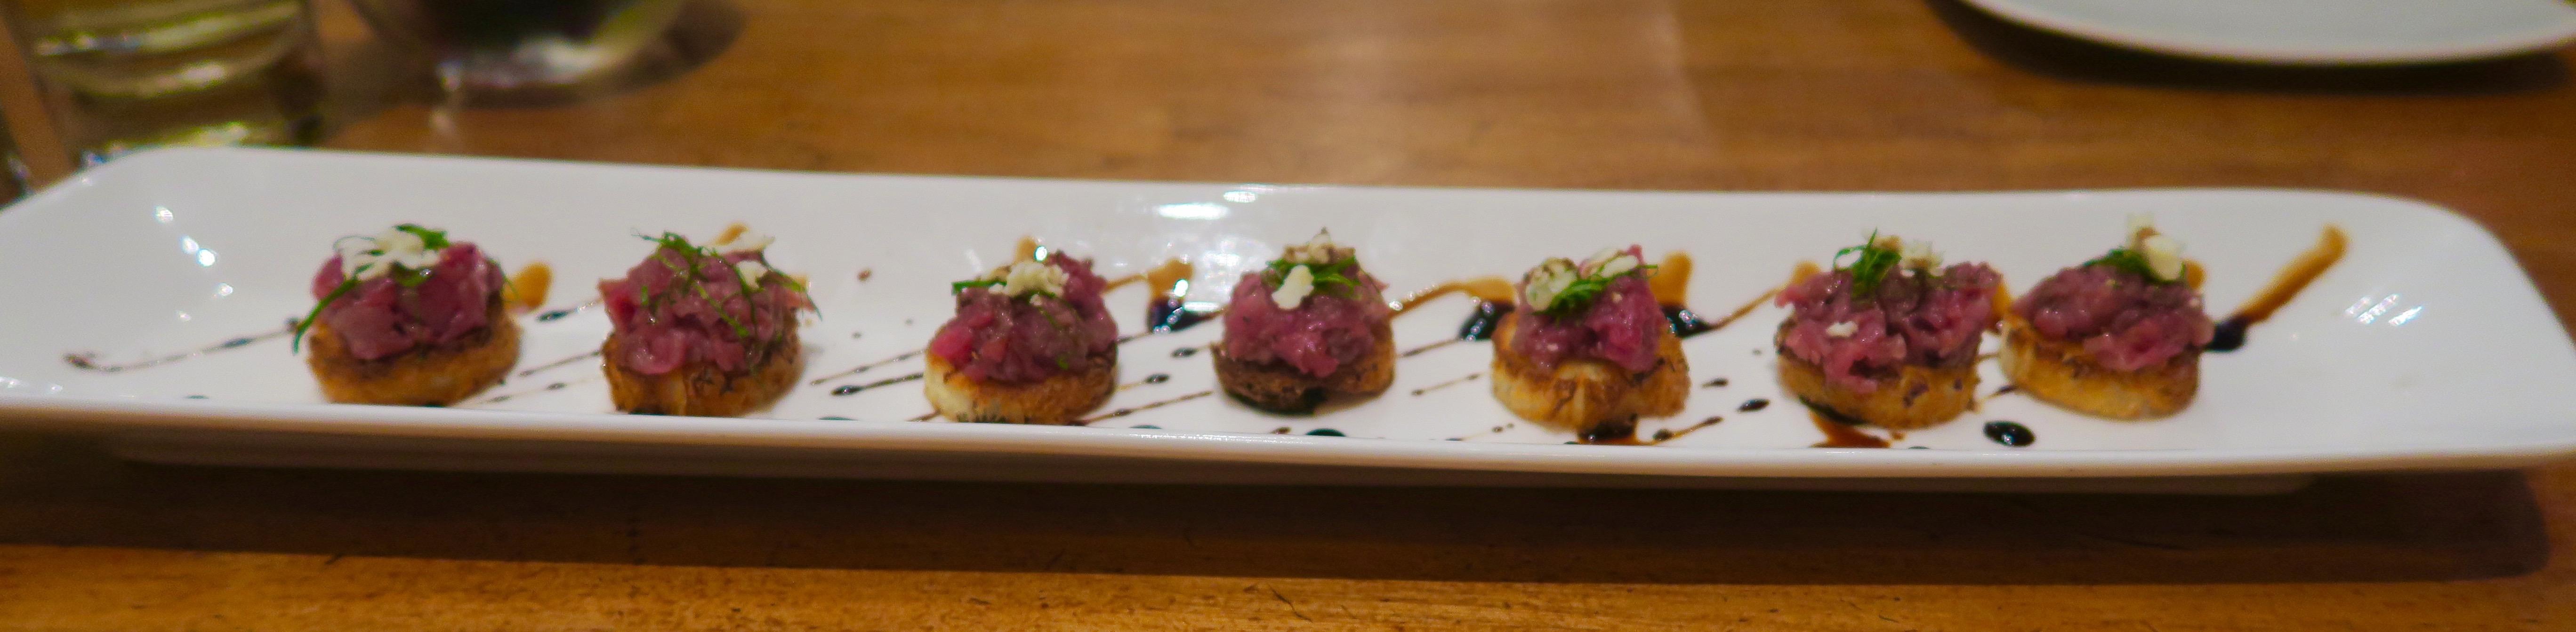 2. Beef Tartare on Brioche with Yuzu Dashi, 5 Fusion